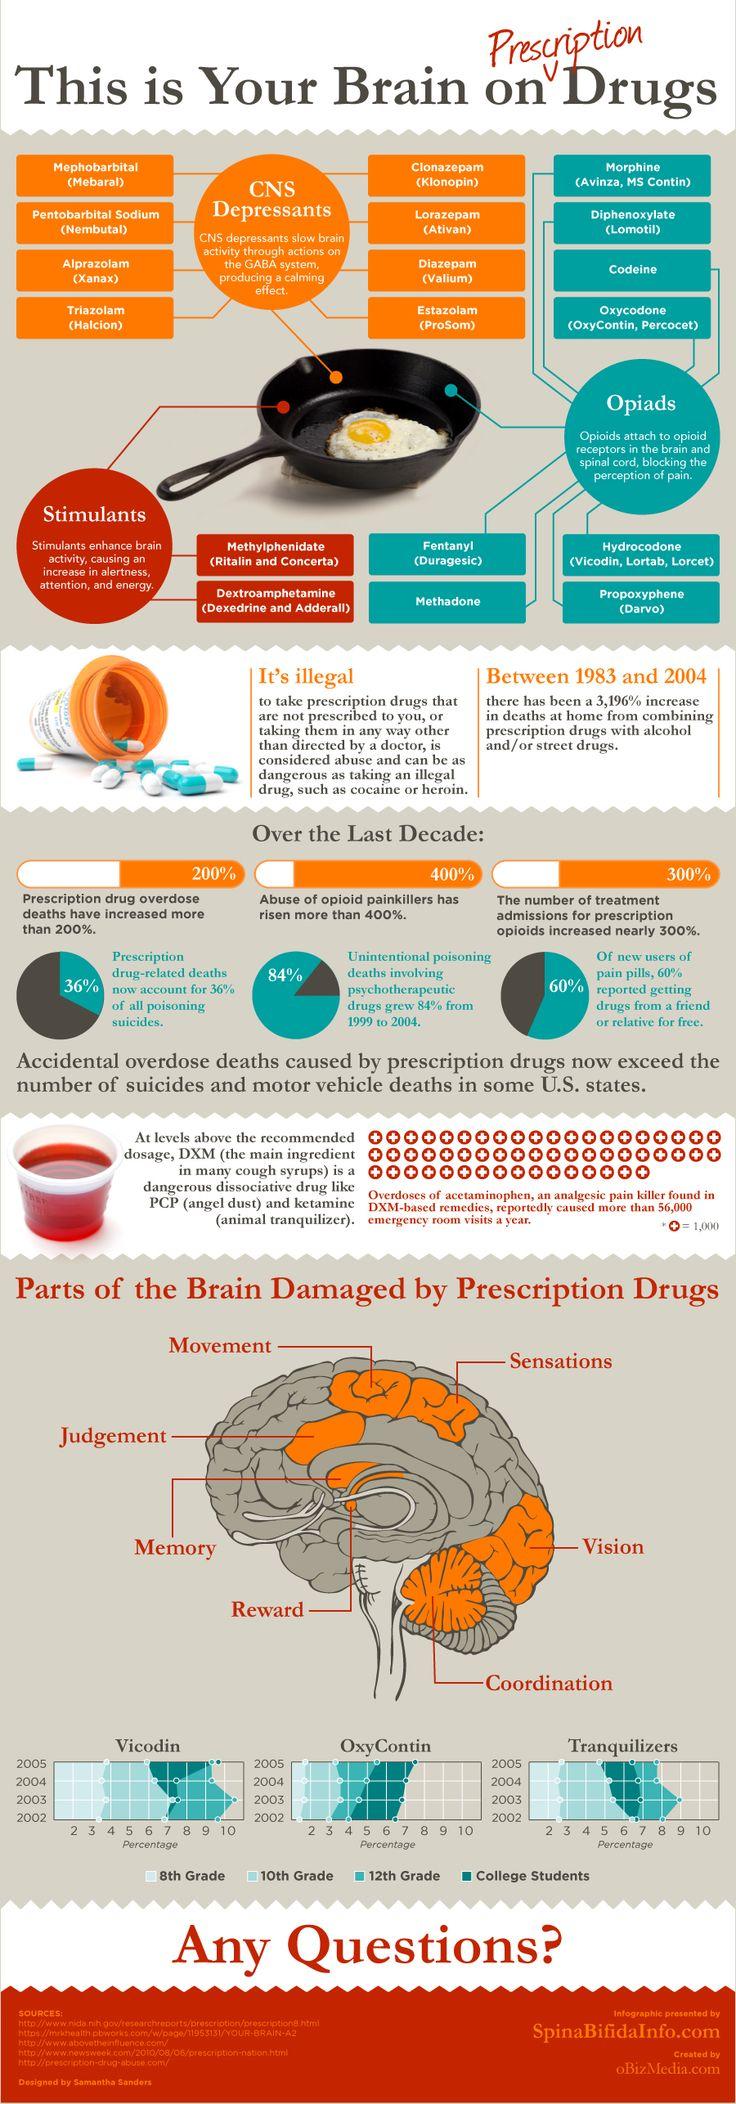 This is your brain on prescription drugs.   #addiction #prescriptiondrugs #infographic www.NewBeginningsDetox.com